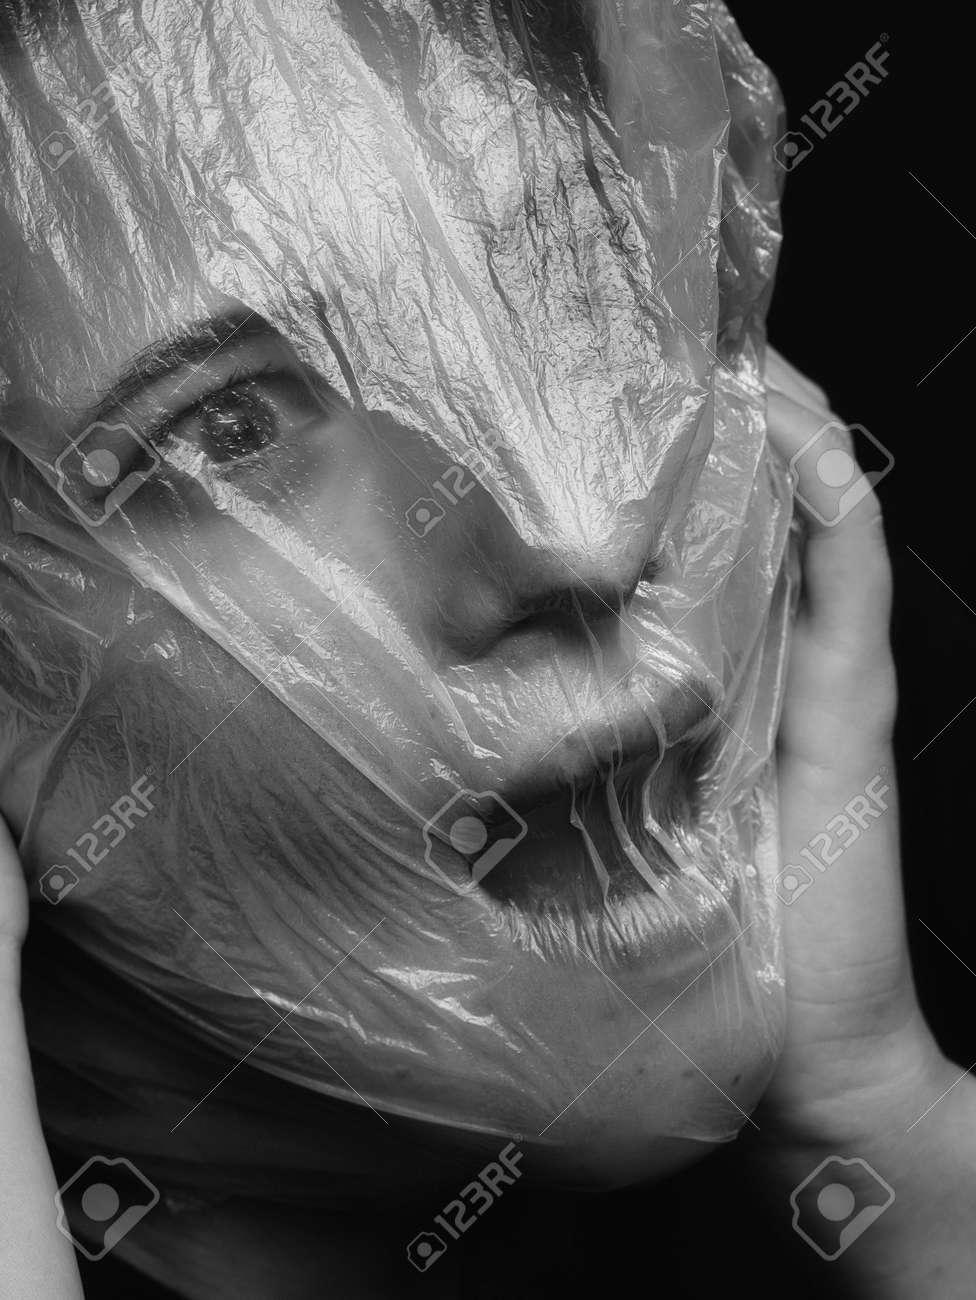 high key. Conceptual portrait with plastic sheets. One young woman strugling with plastic sheets. - 164118917